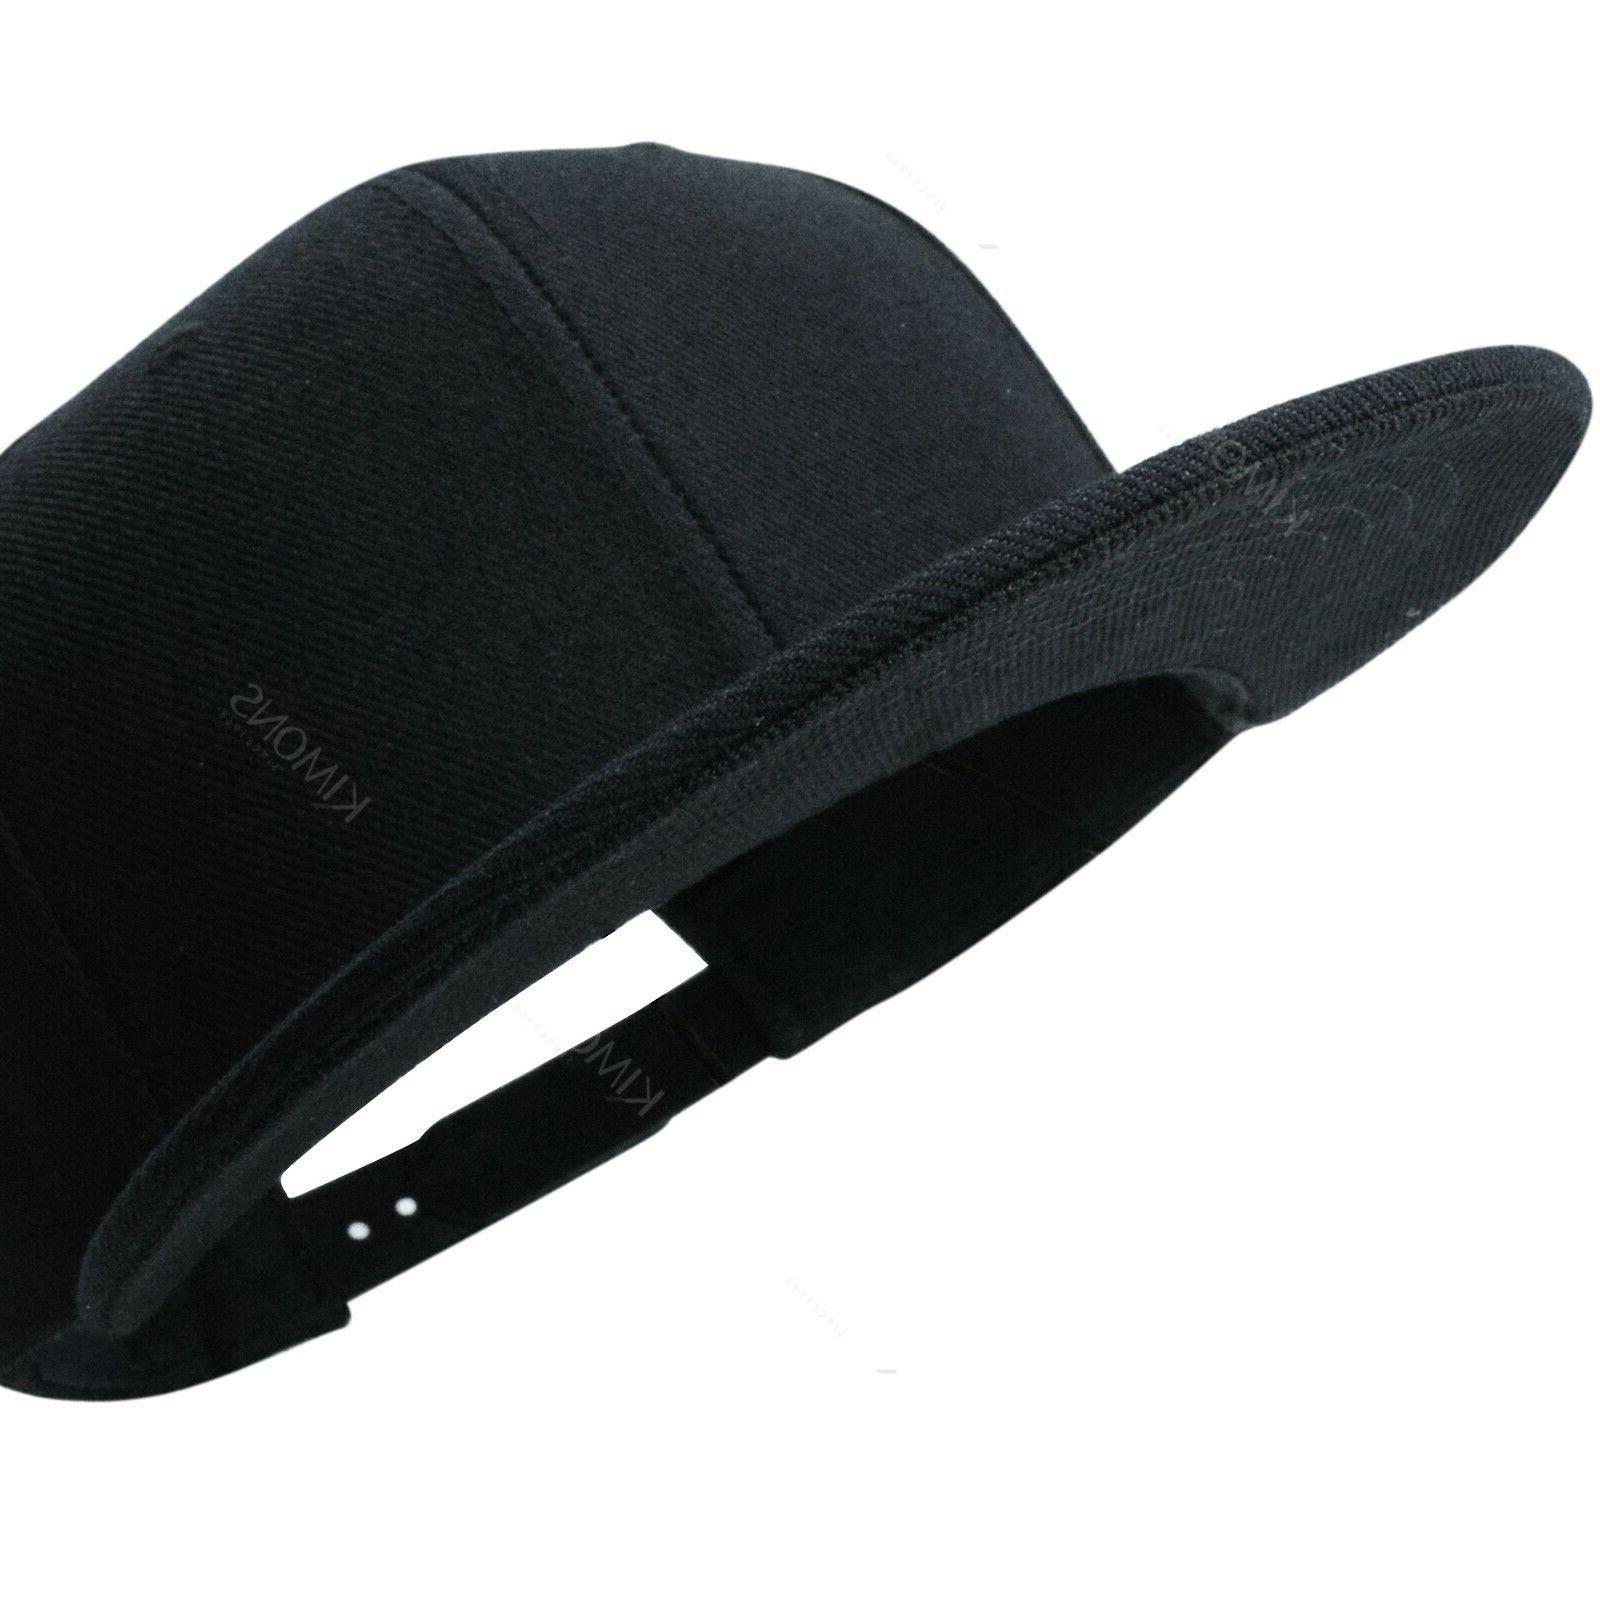 Snapback Hat Flat Cap Blank Hop Adjustable